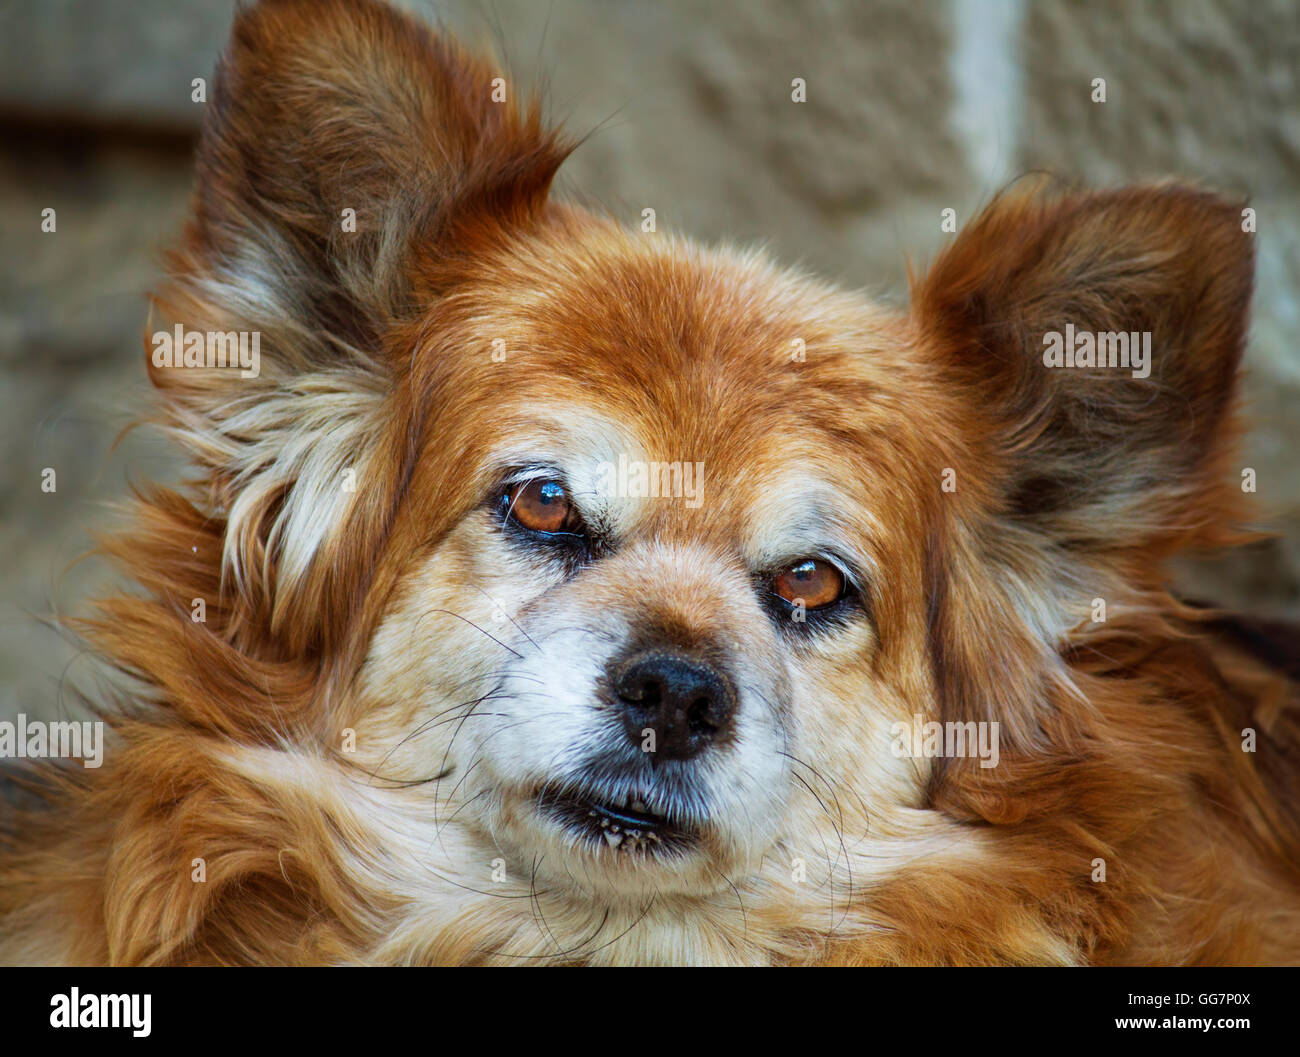 Purebred Papillon Dog Portrait Stock Photo 113267642 Alamy